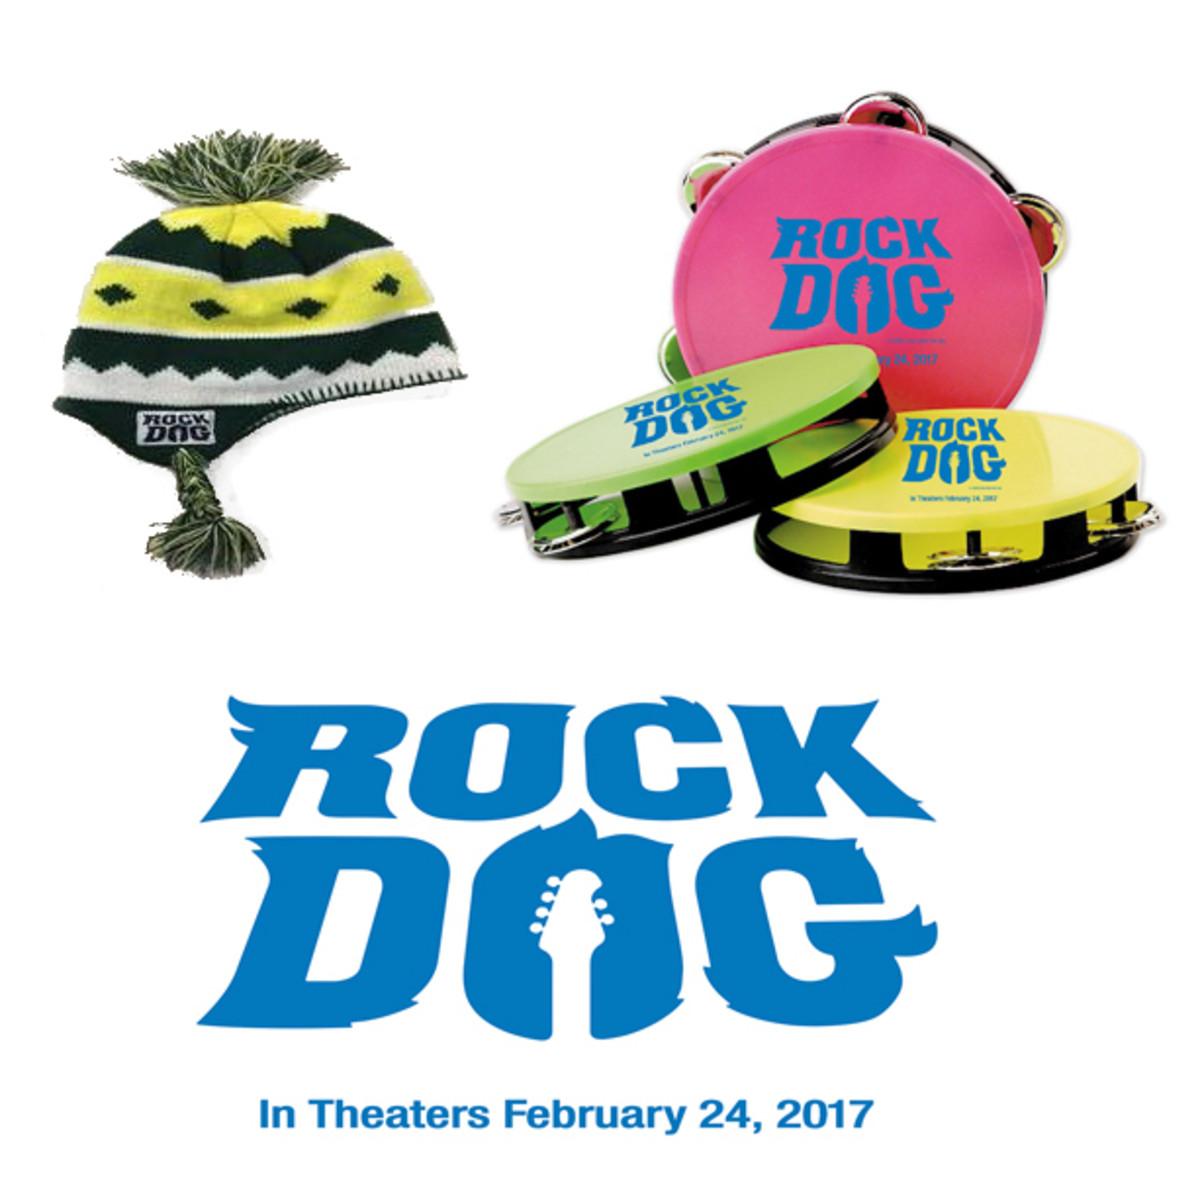 Rock Dog Movie Giveaway